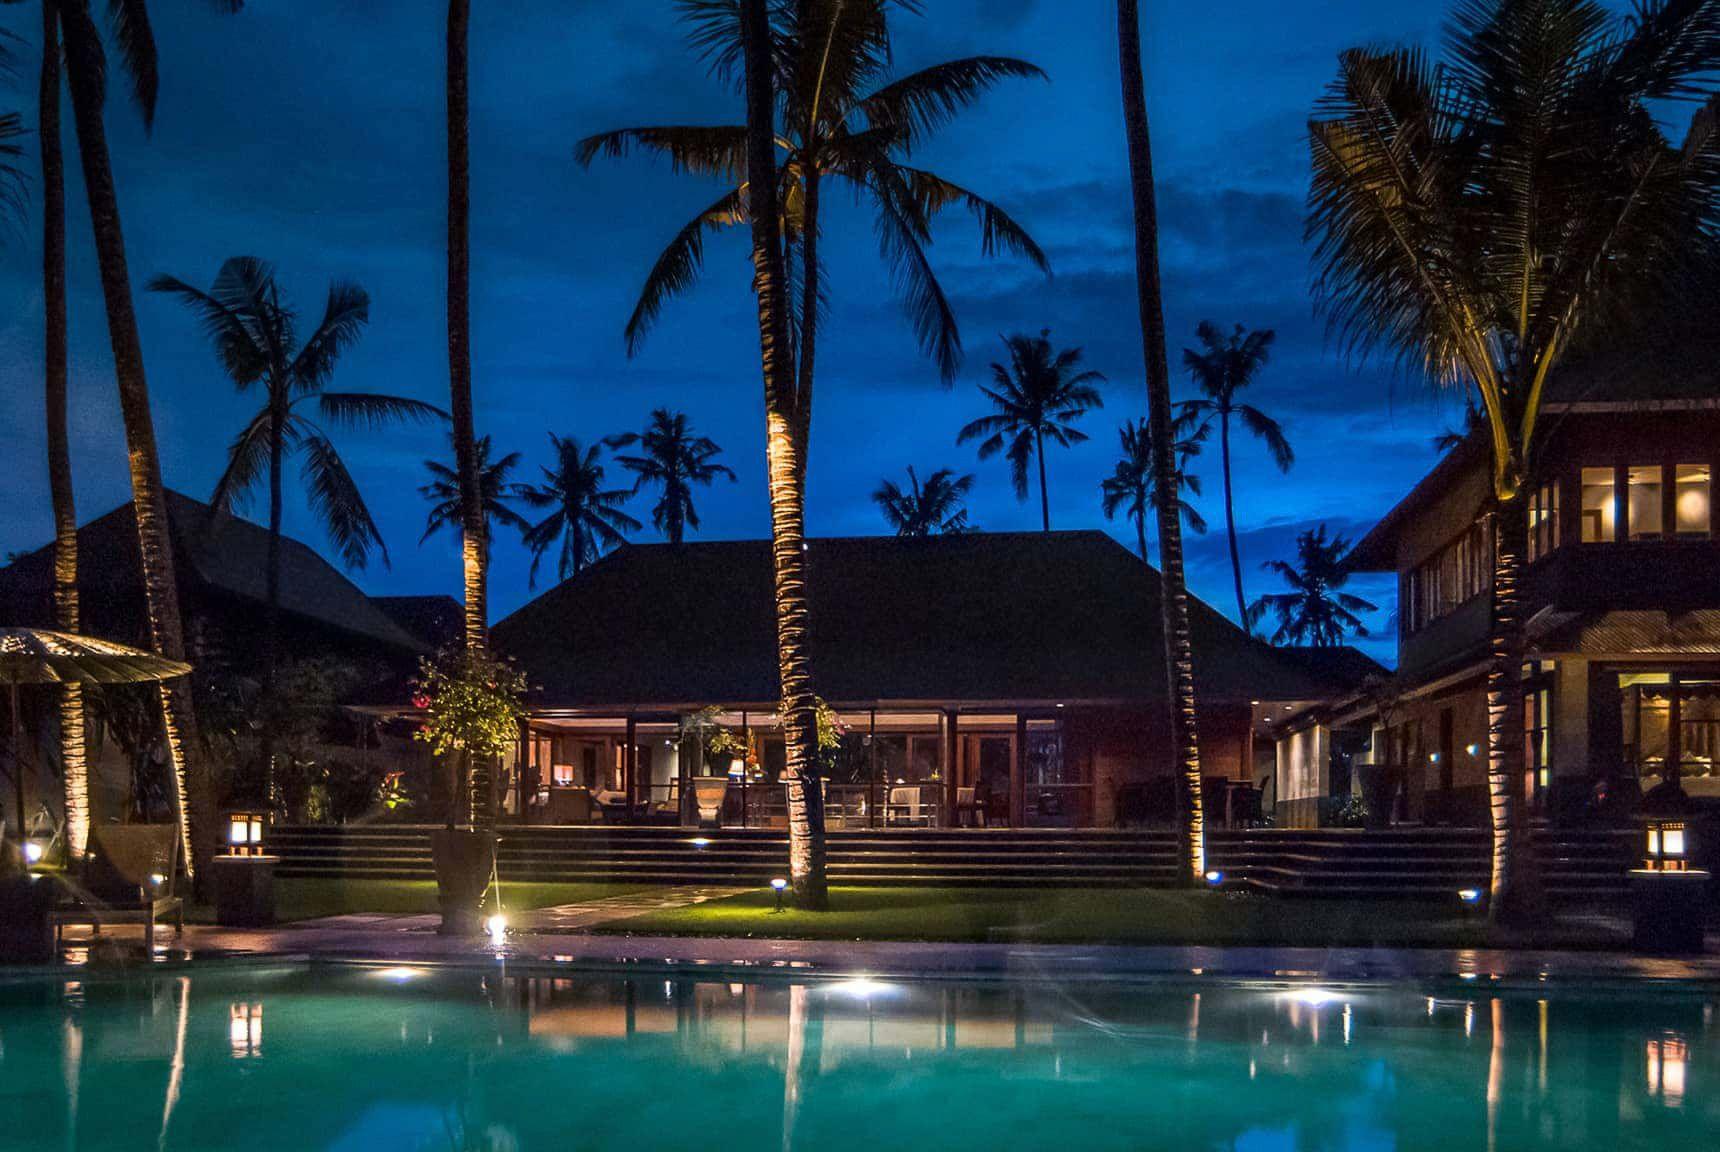 Bali Villa Photography Villa Pushpapuri Pool Views Dusk Lighting Bali Luxury Villas Bali Villa